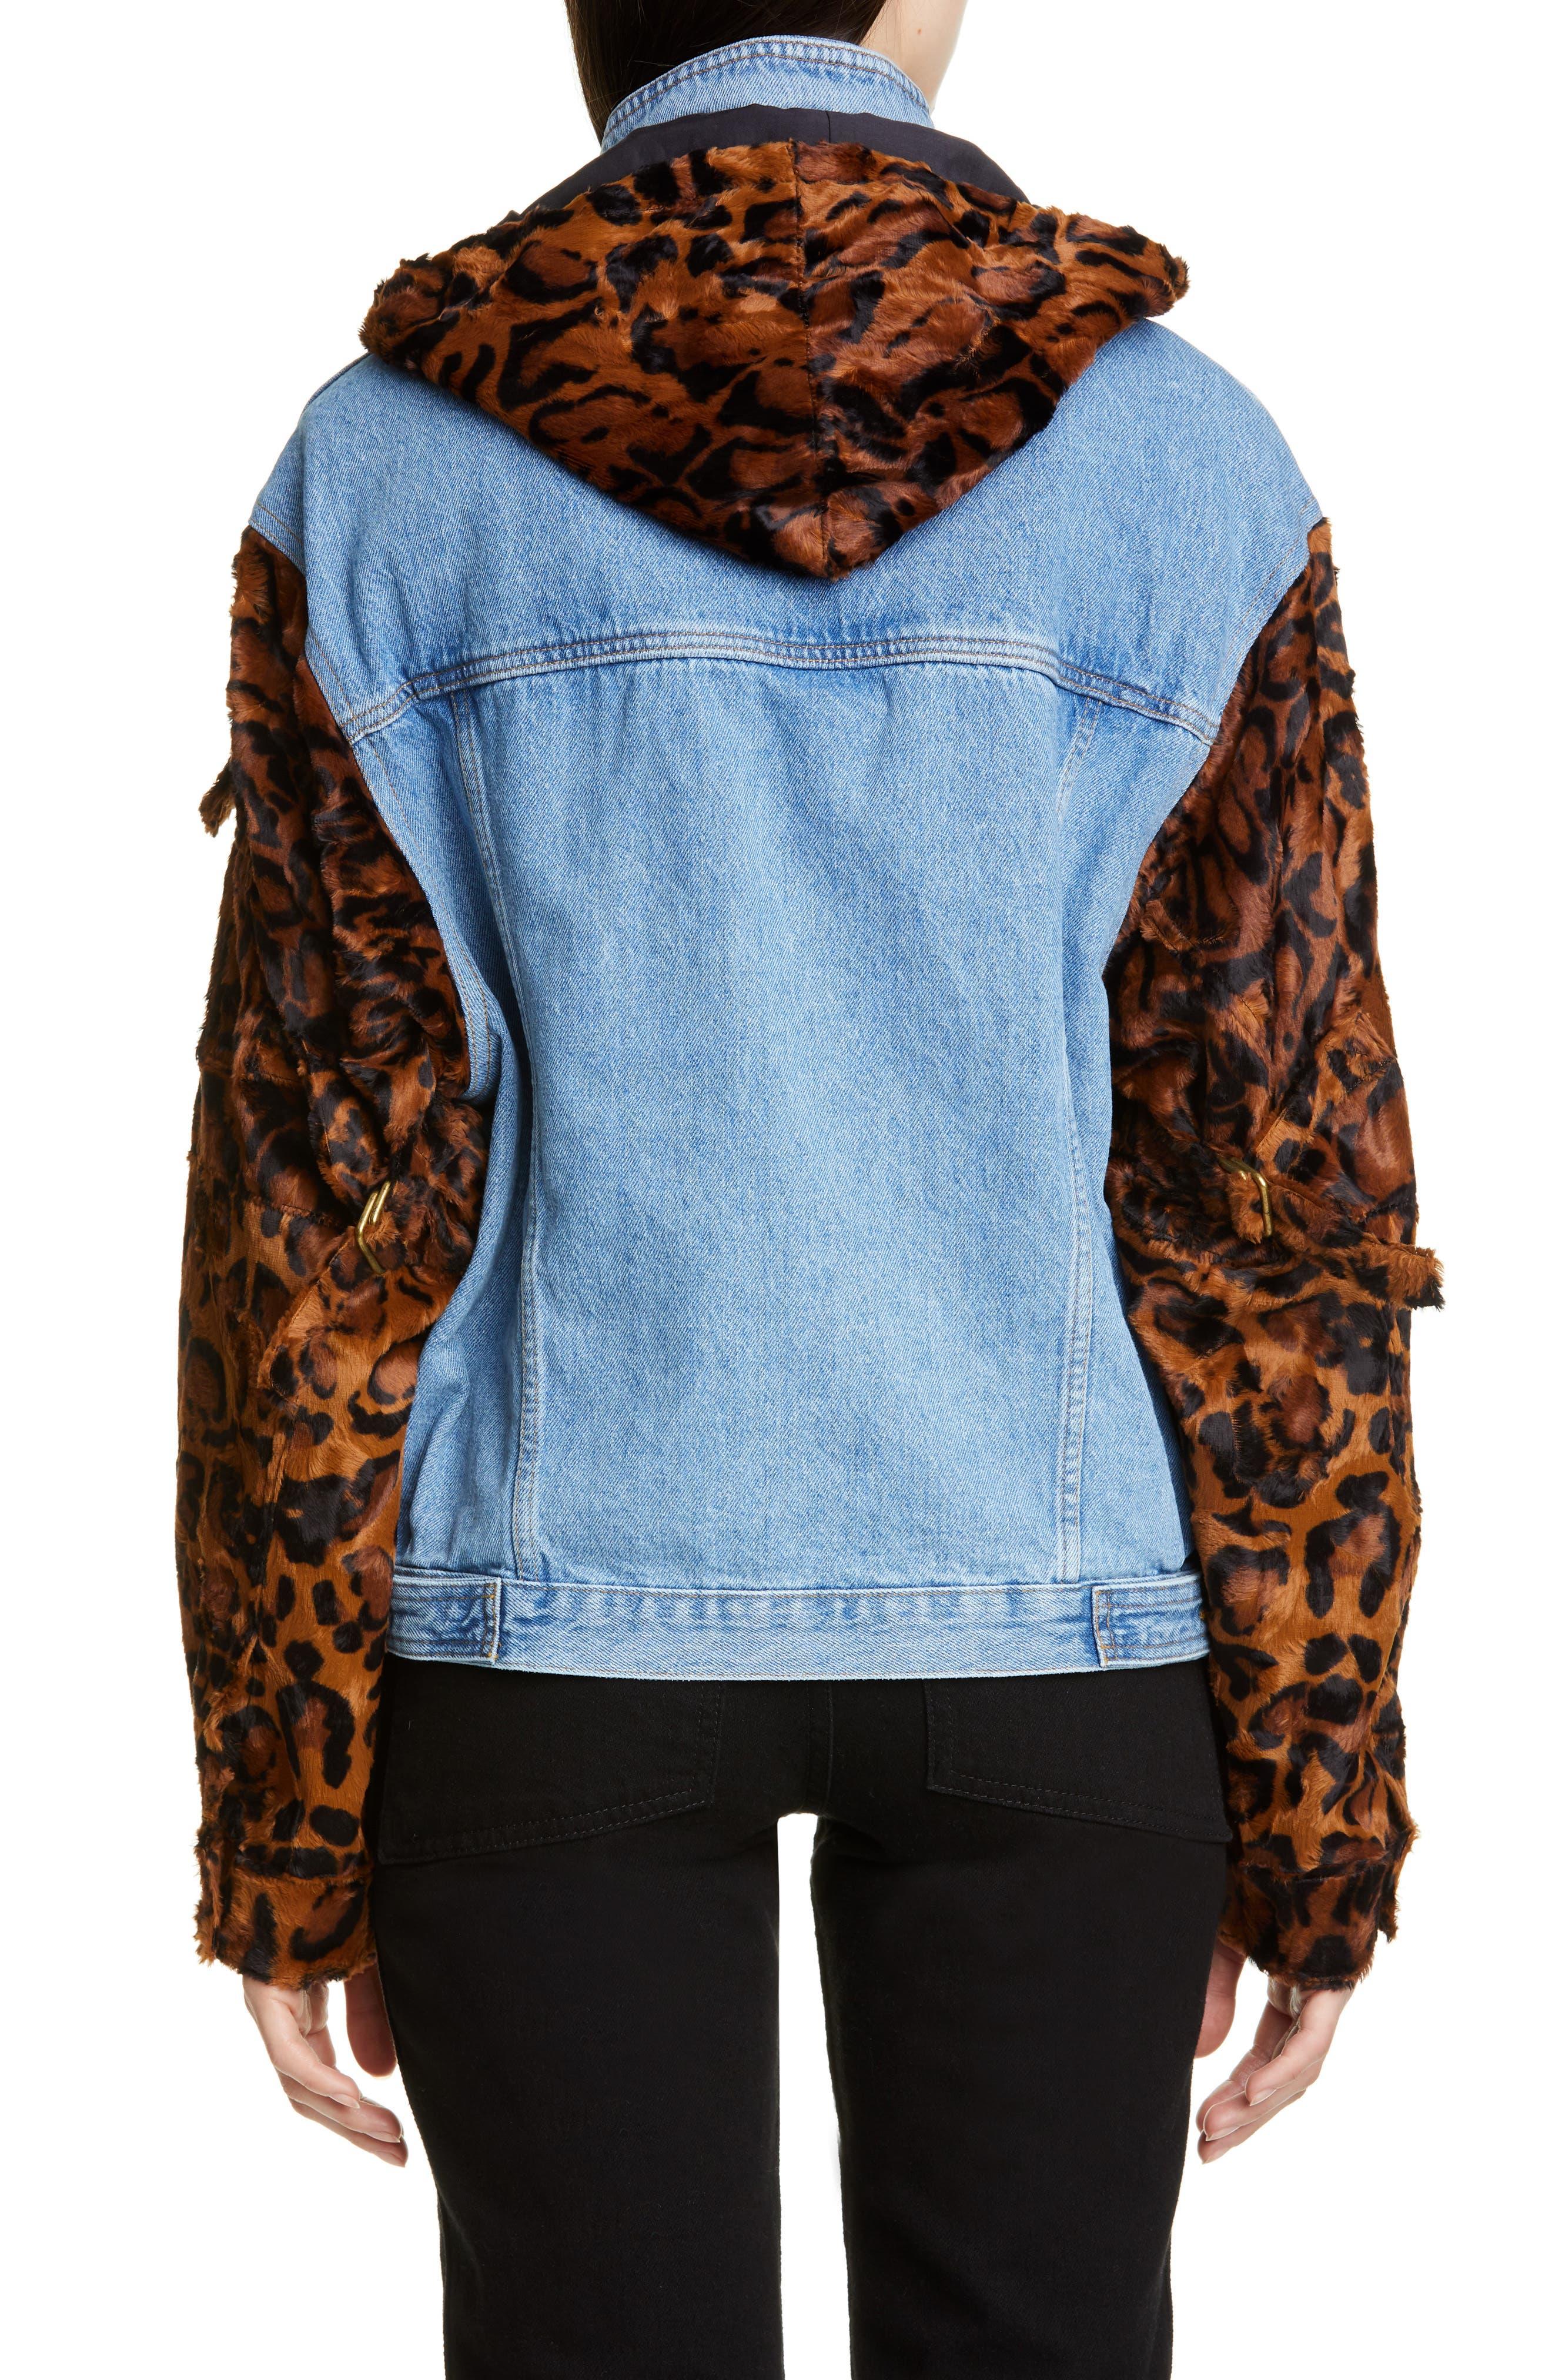 MARTINE ROSE, Leopard Hooded Denim Jacket, Alternate thumbnail 3, color, LIGHT DENIM DARK